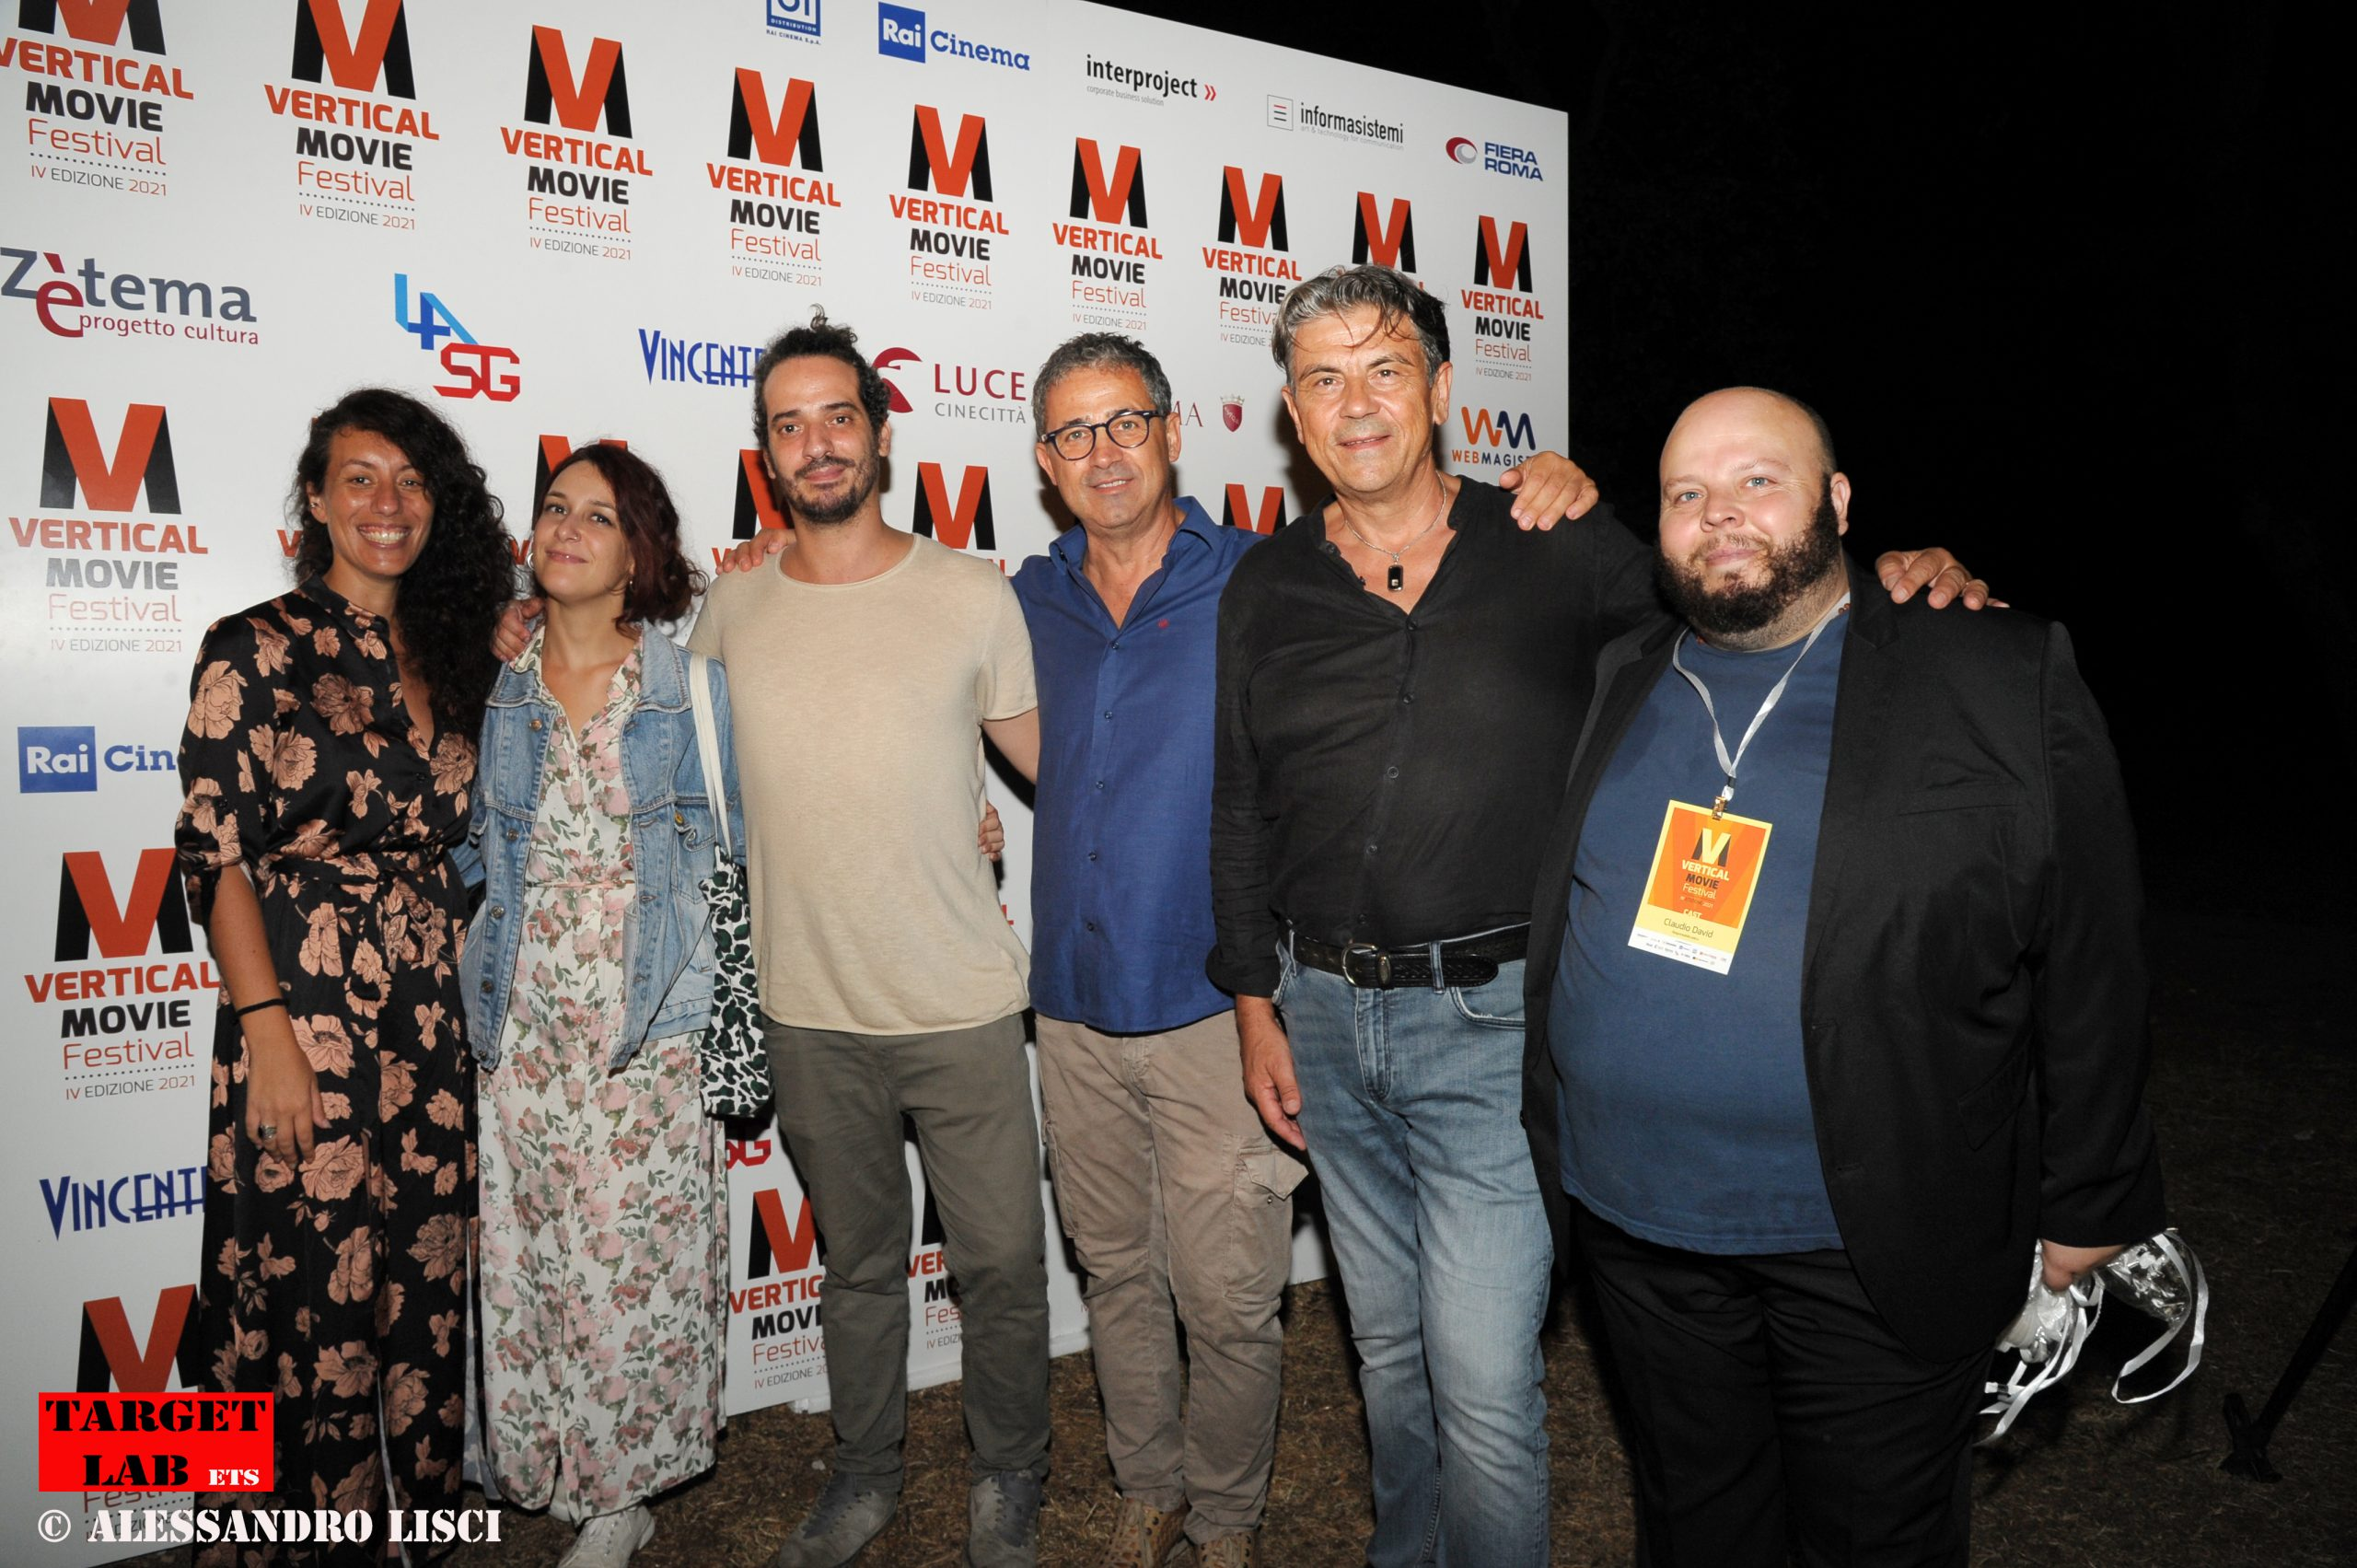 alt tag Vertical Movie Festival